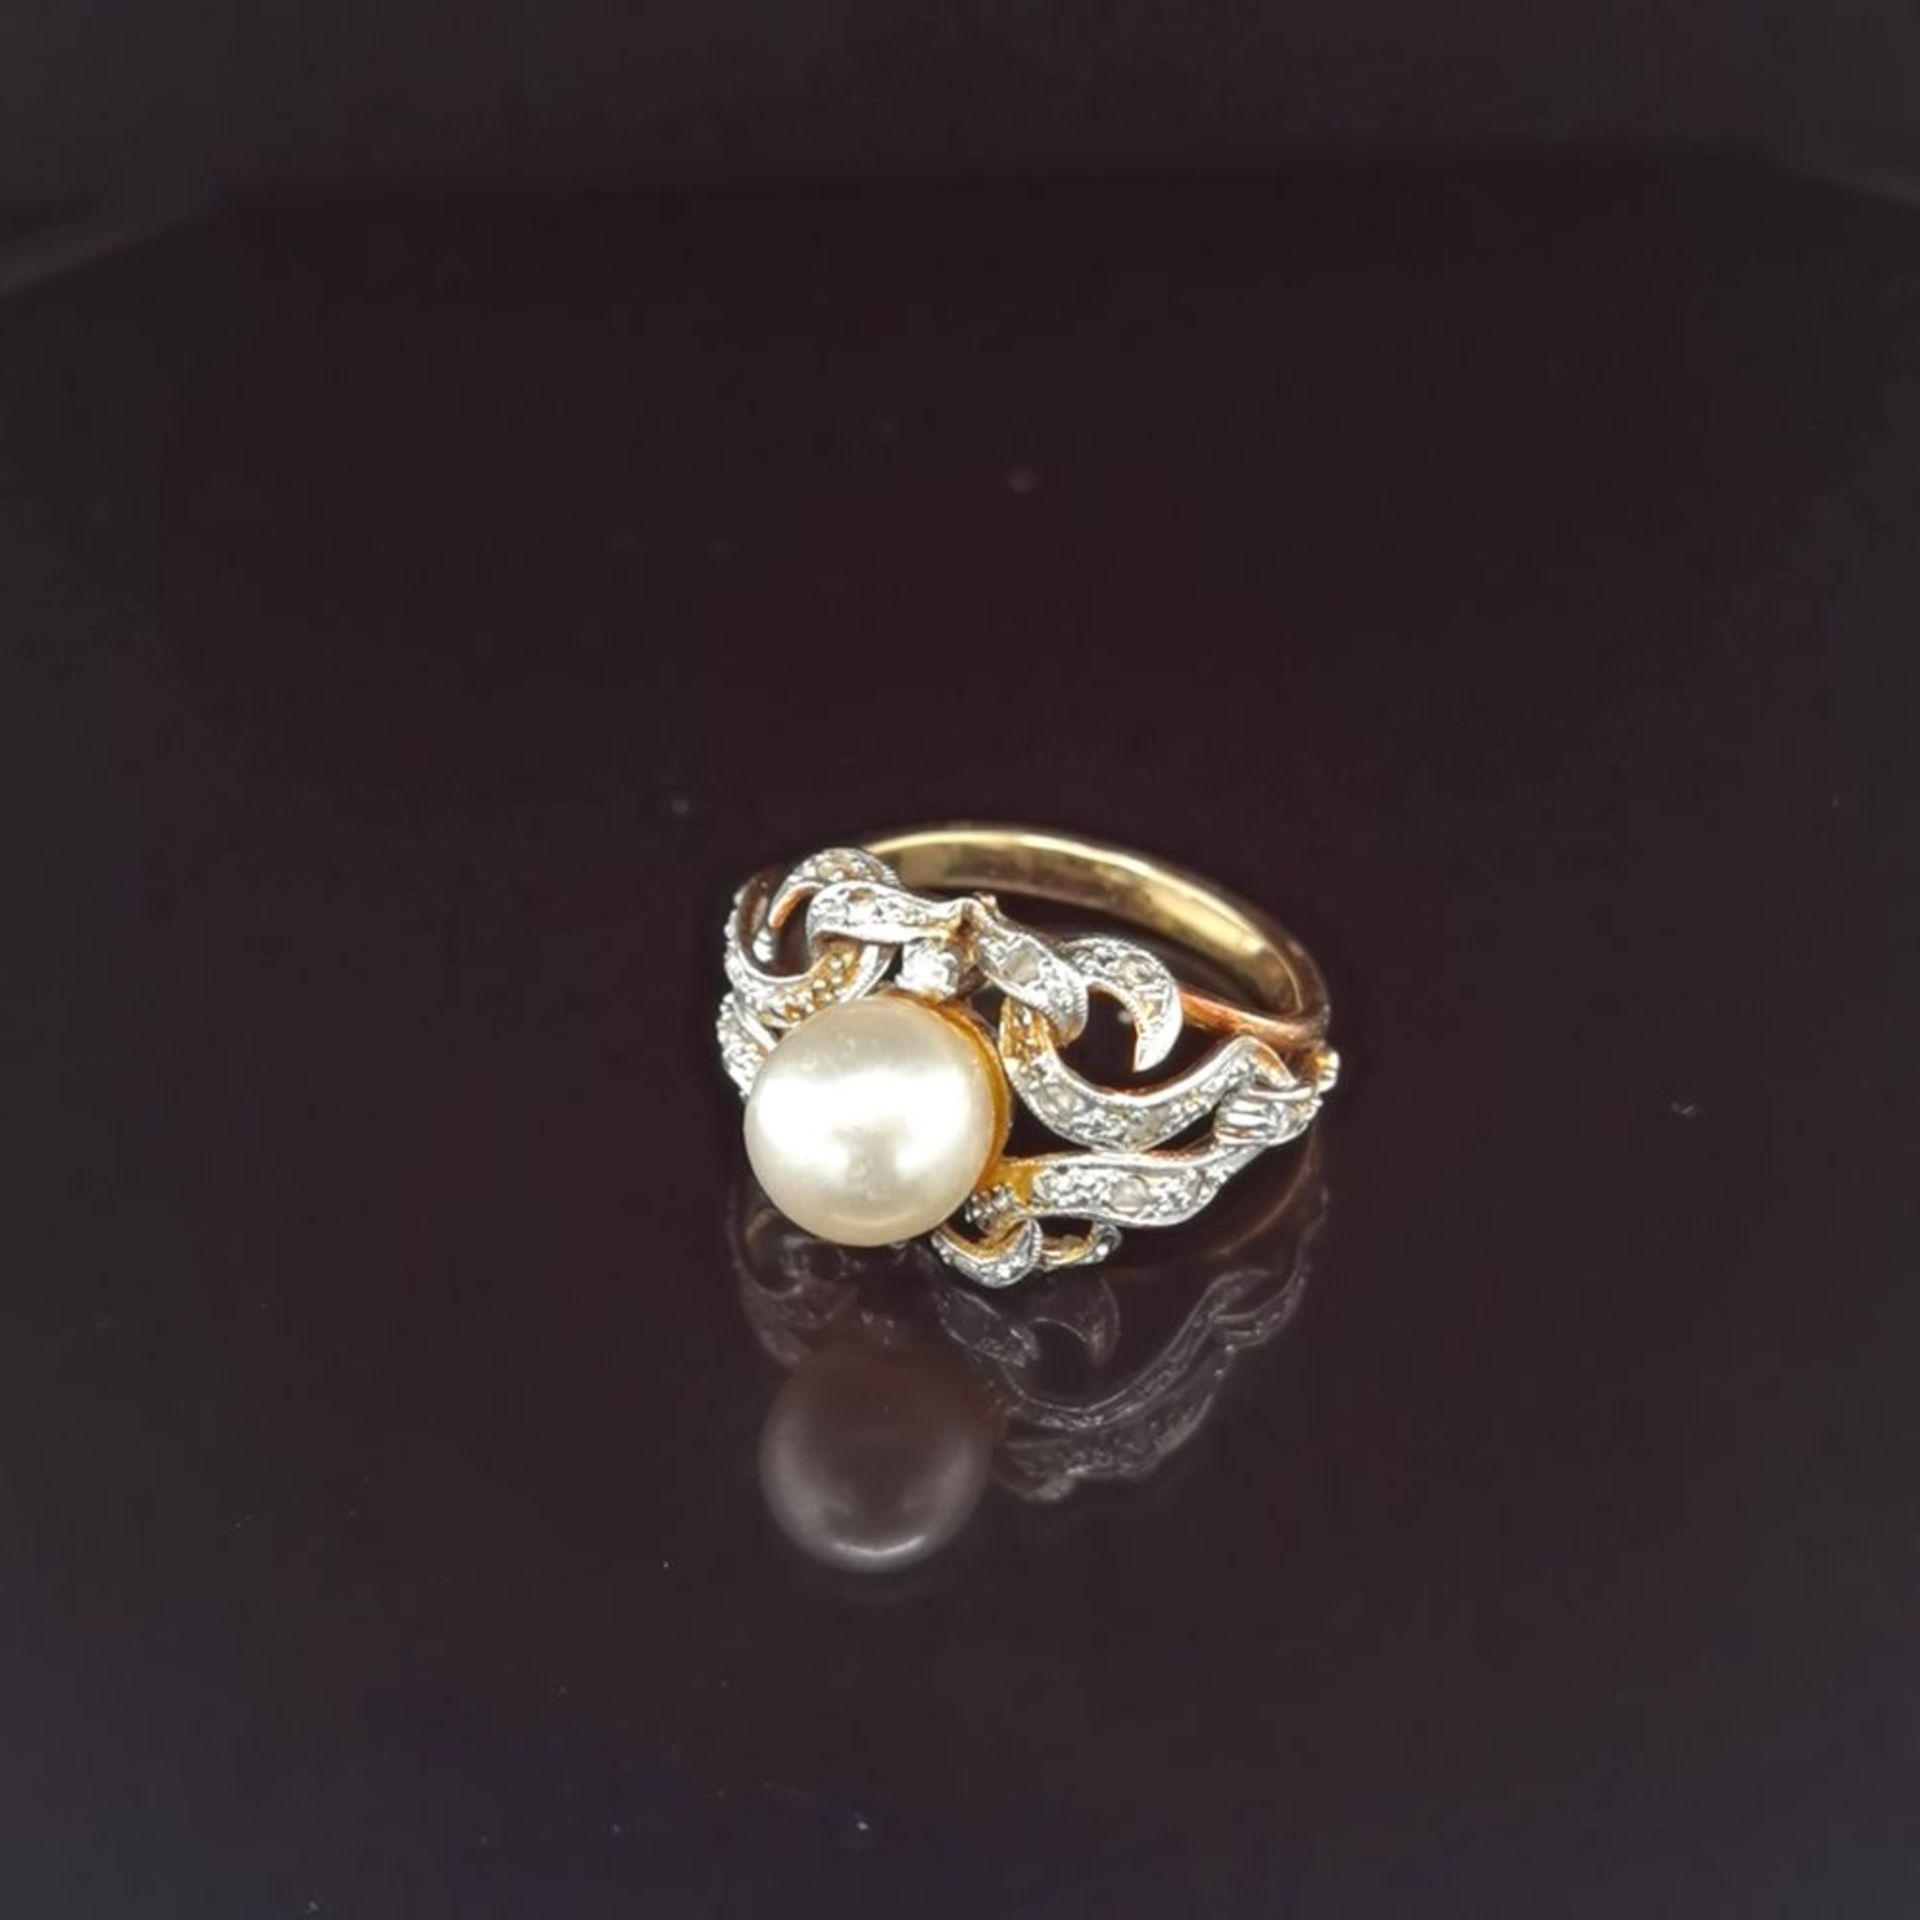 Perl-Diamant-Ring, 585 Gold 5,8